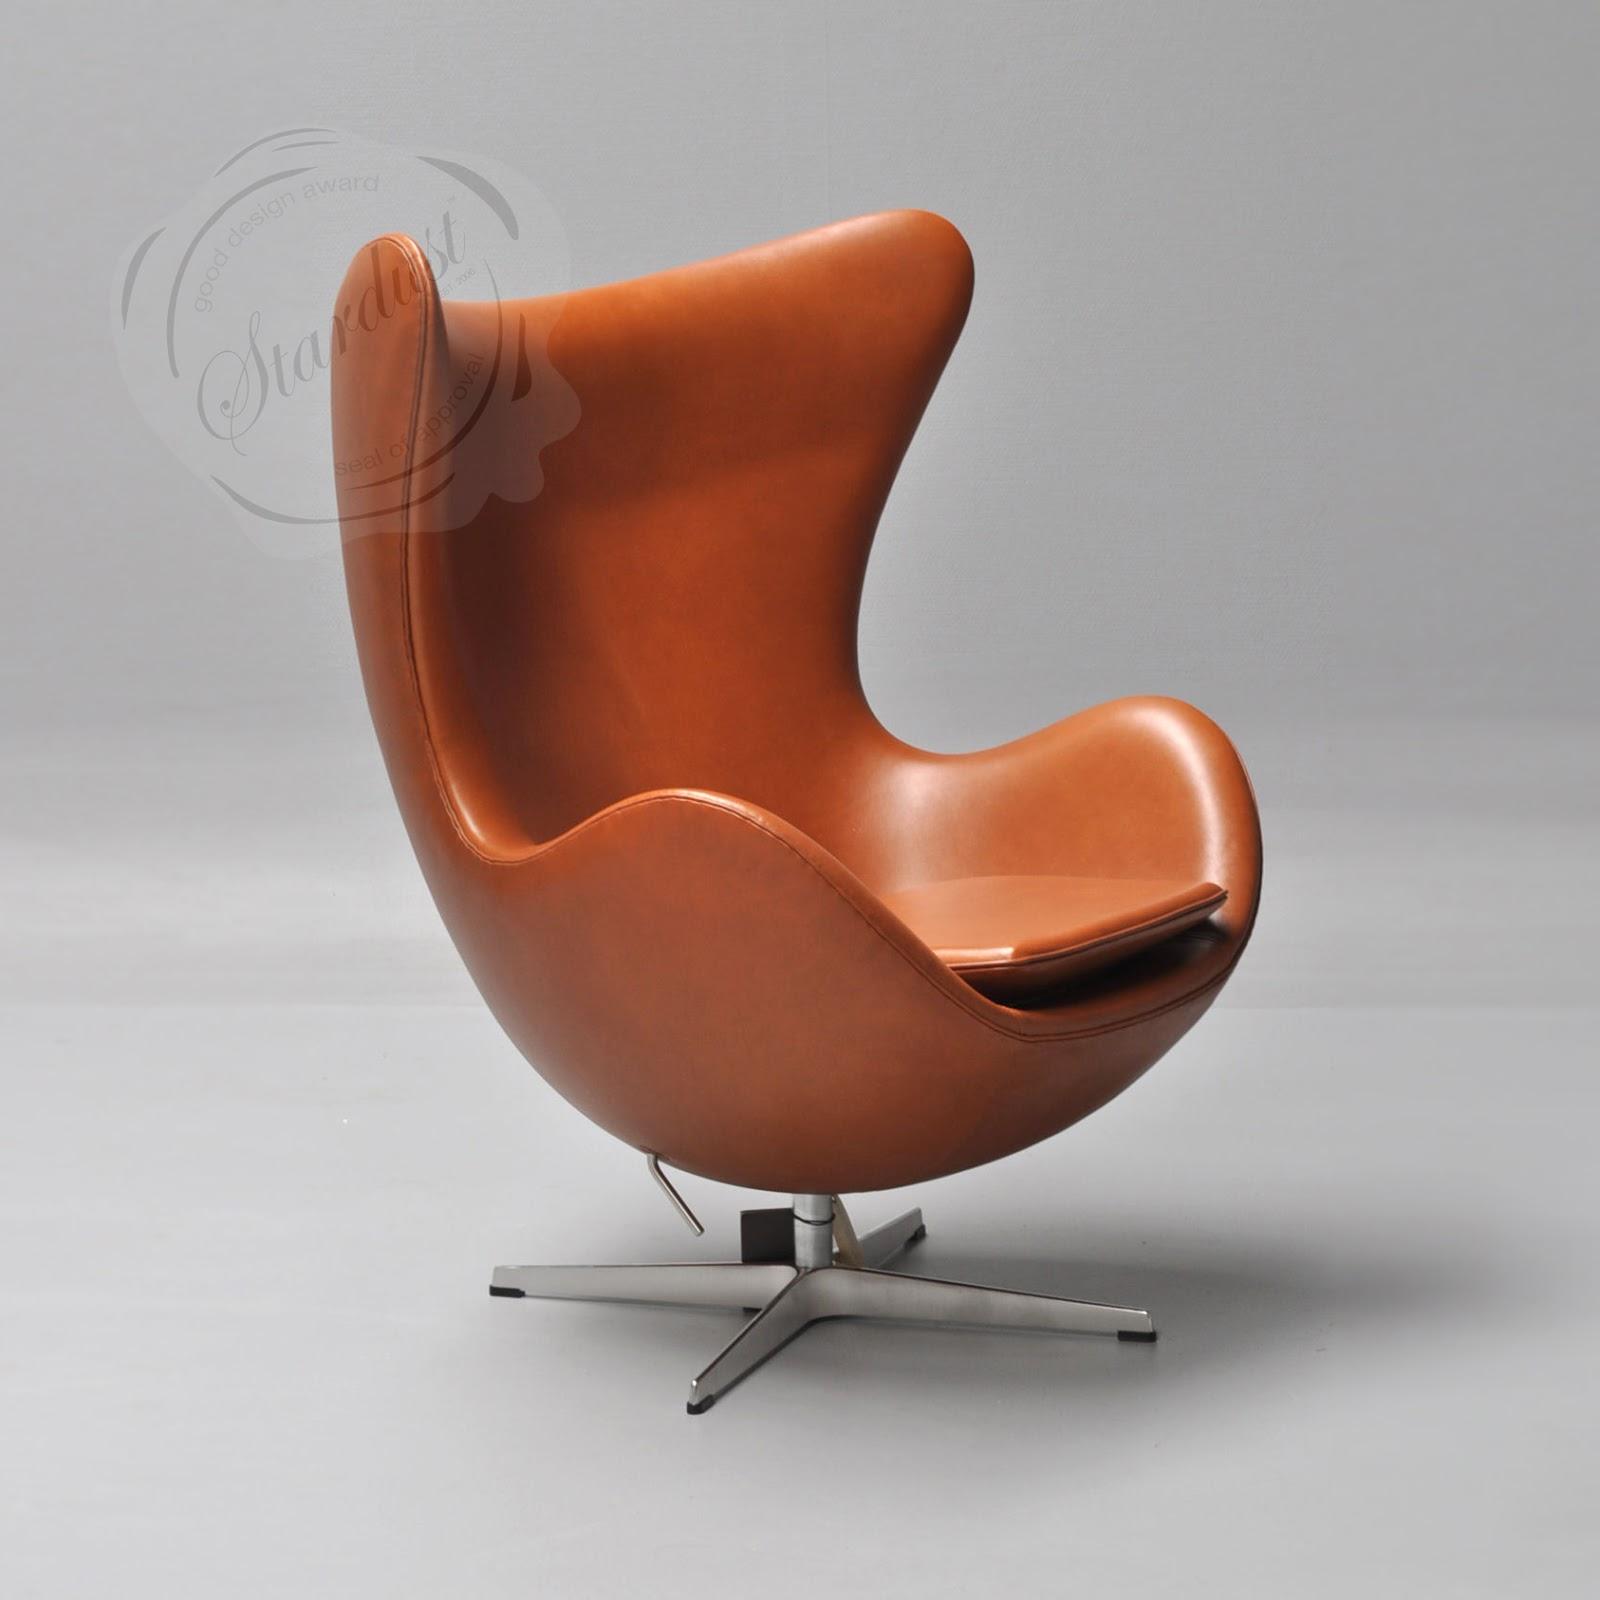 egg fritz hansen leather chair. Black Bedroom Furniture Sets. Home Design Ideas